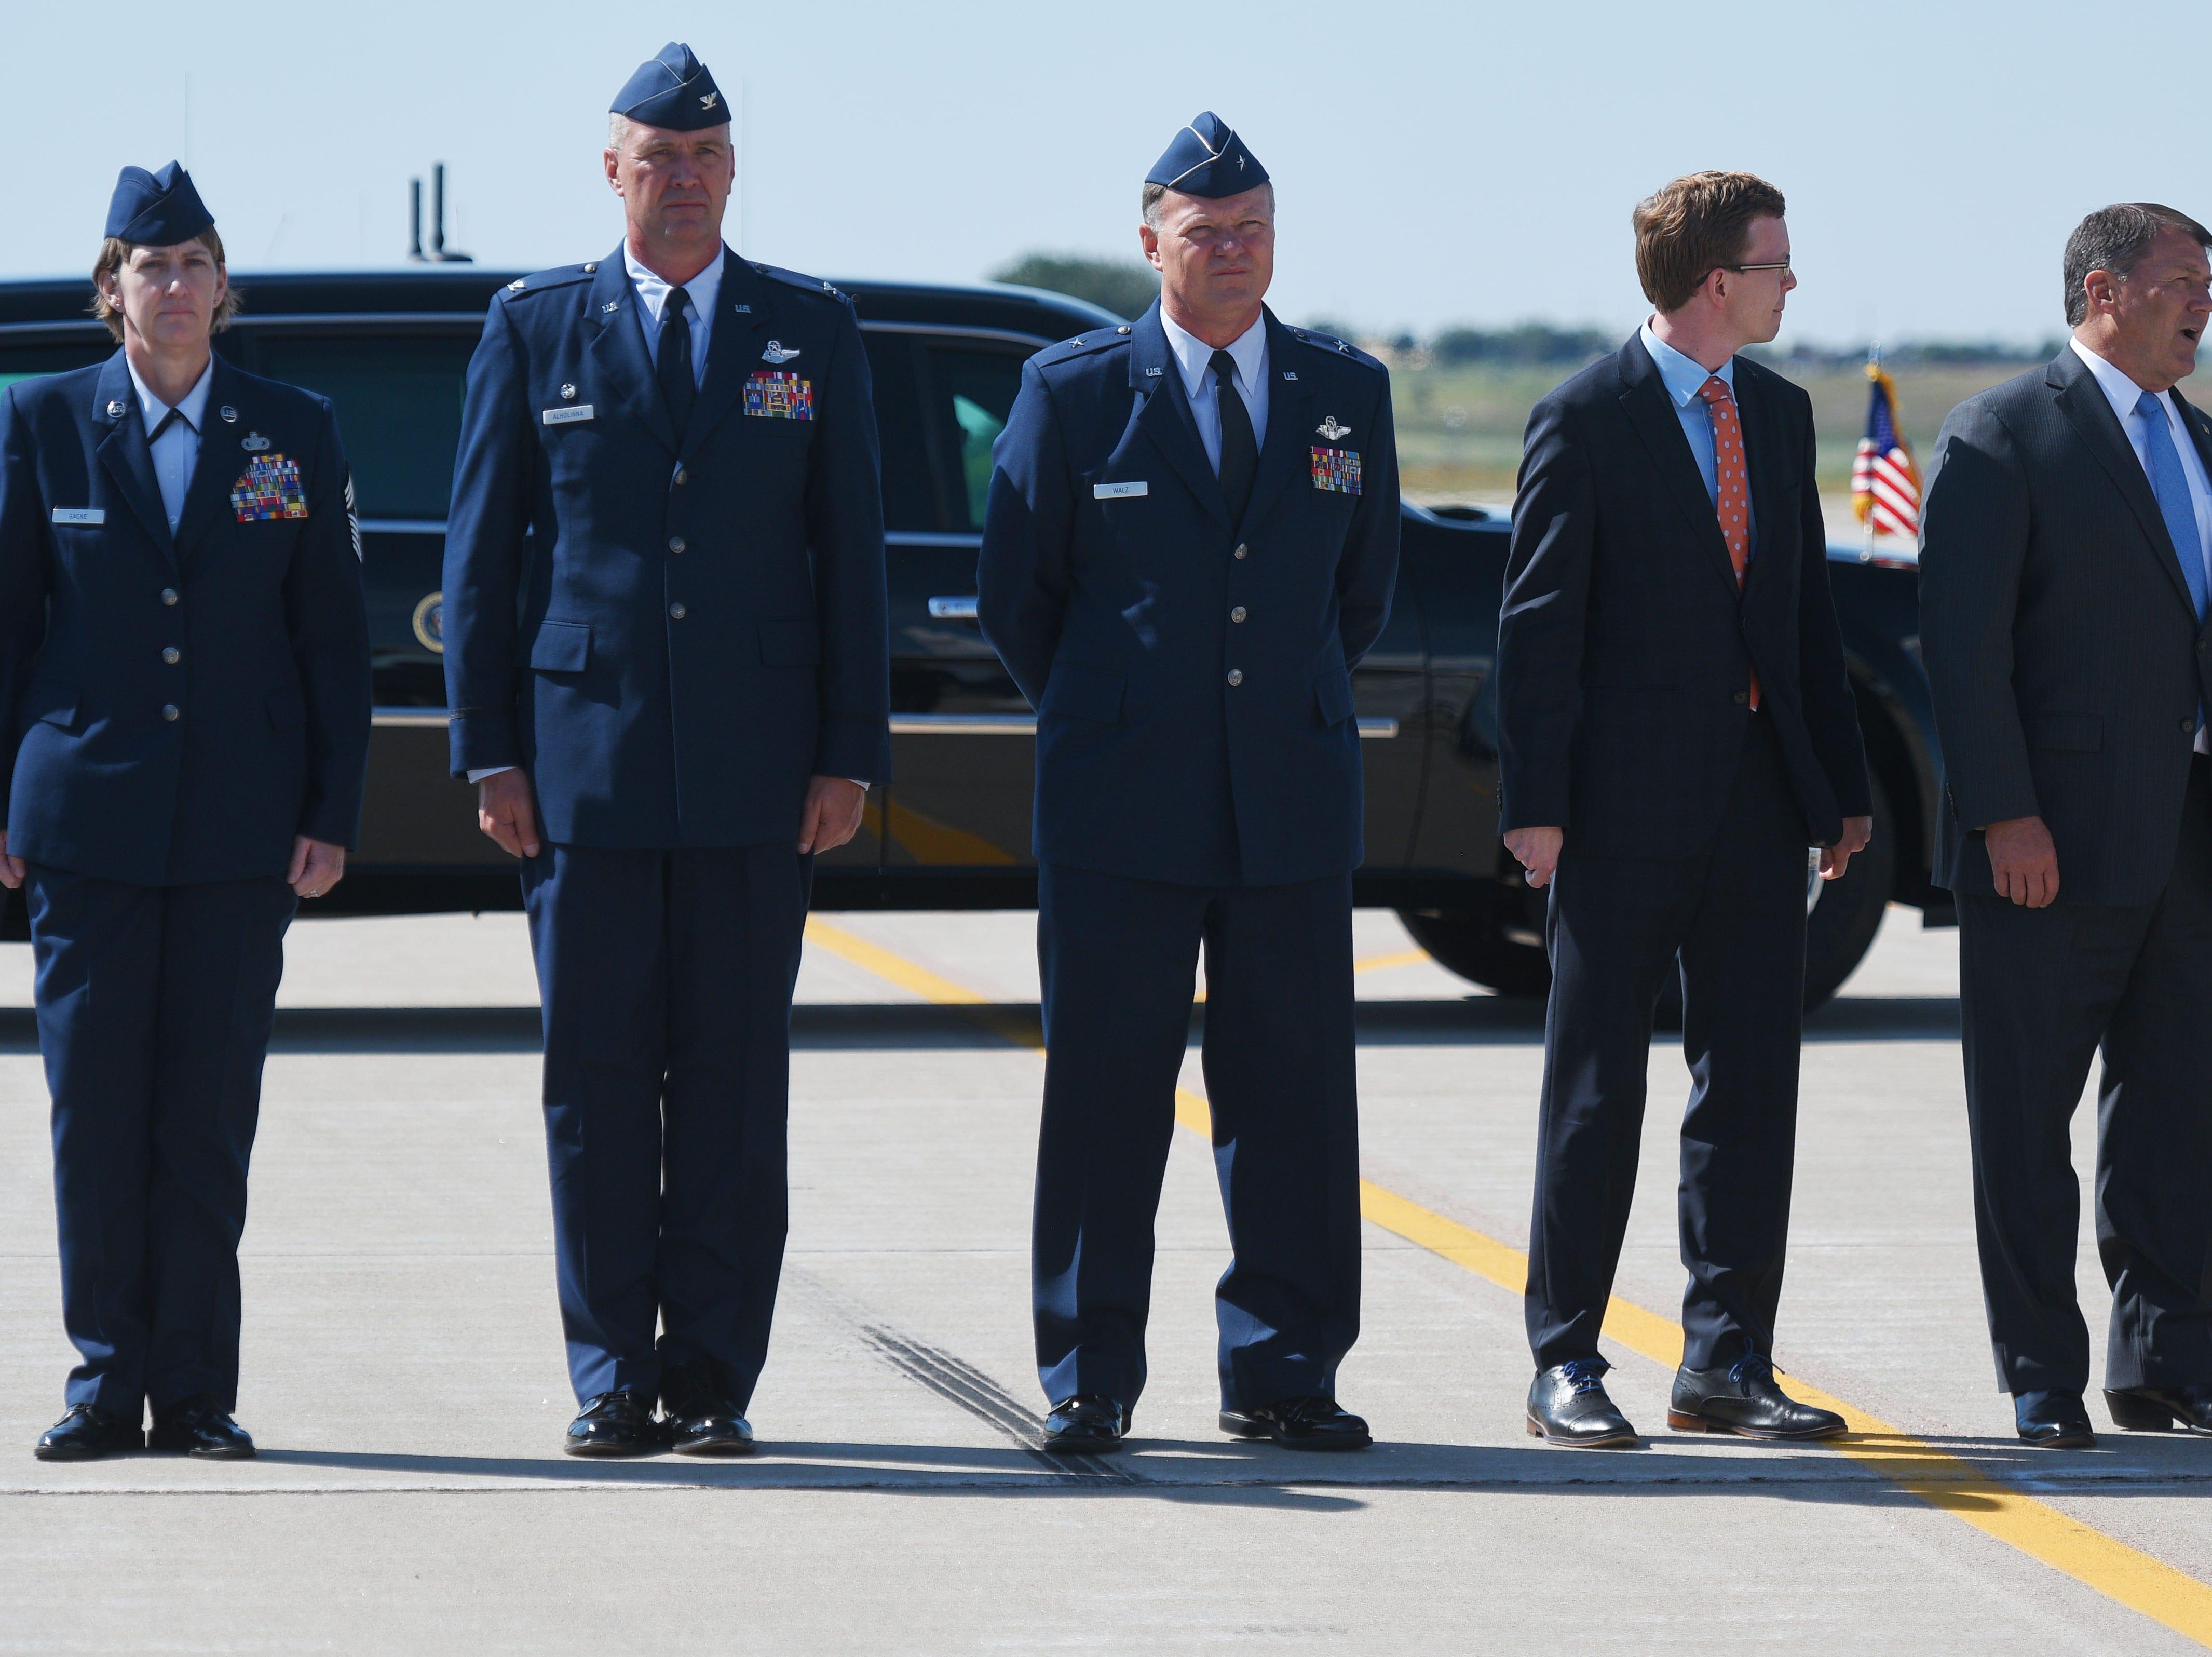 President Donald Trump visits Sioux Falls Friday, Sept. 7, at South Dakota Air National Guard in Sioux Falls.